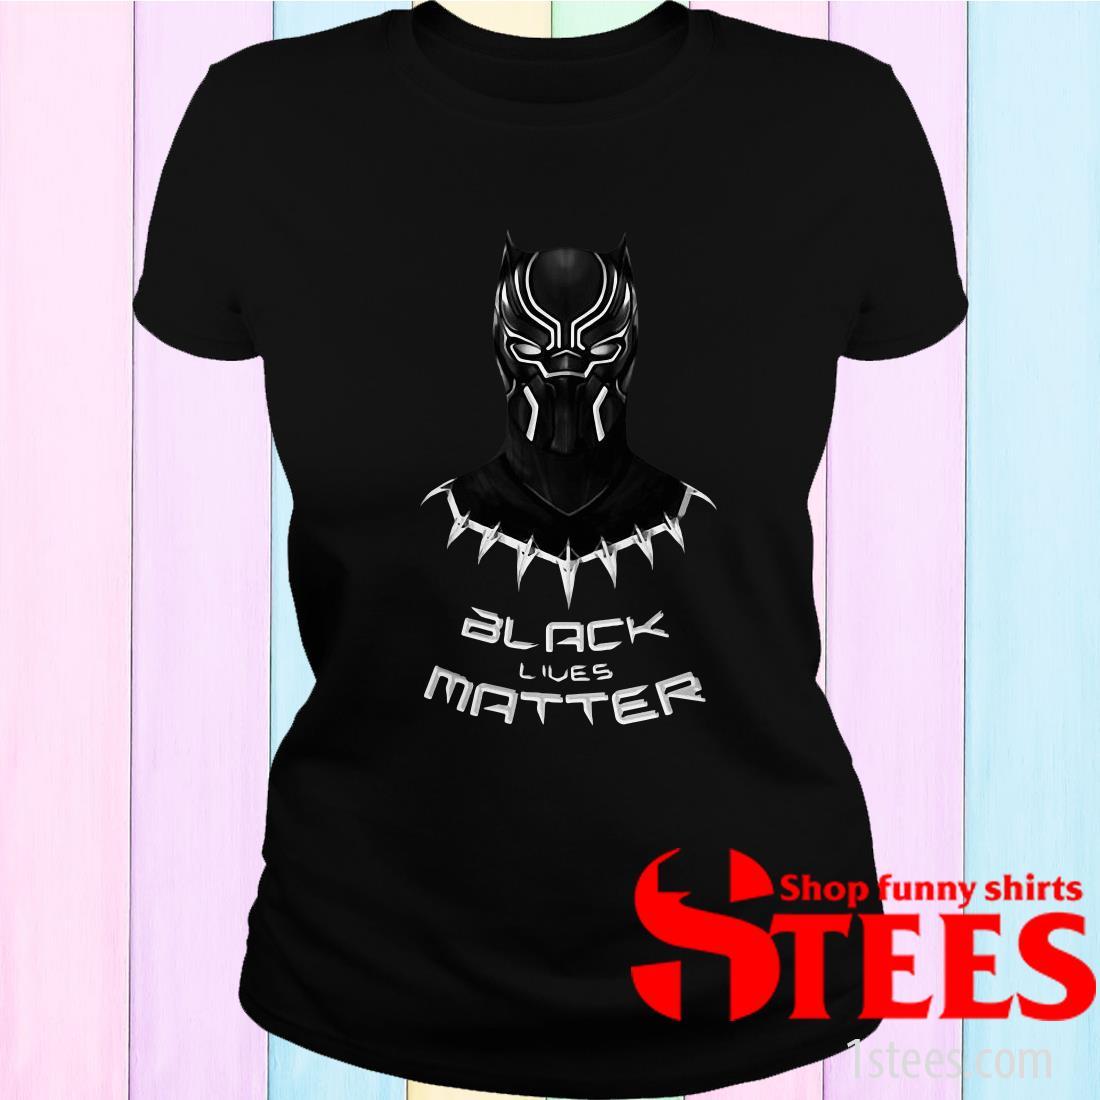 RIP Black Panther Black Lives Matter Chadwick Boseman 1977 2020 Women's T-Shirt